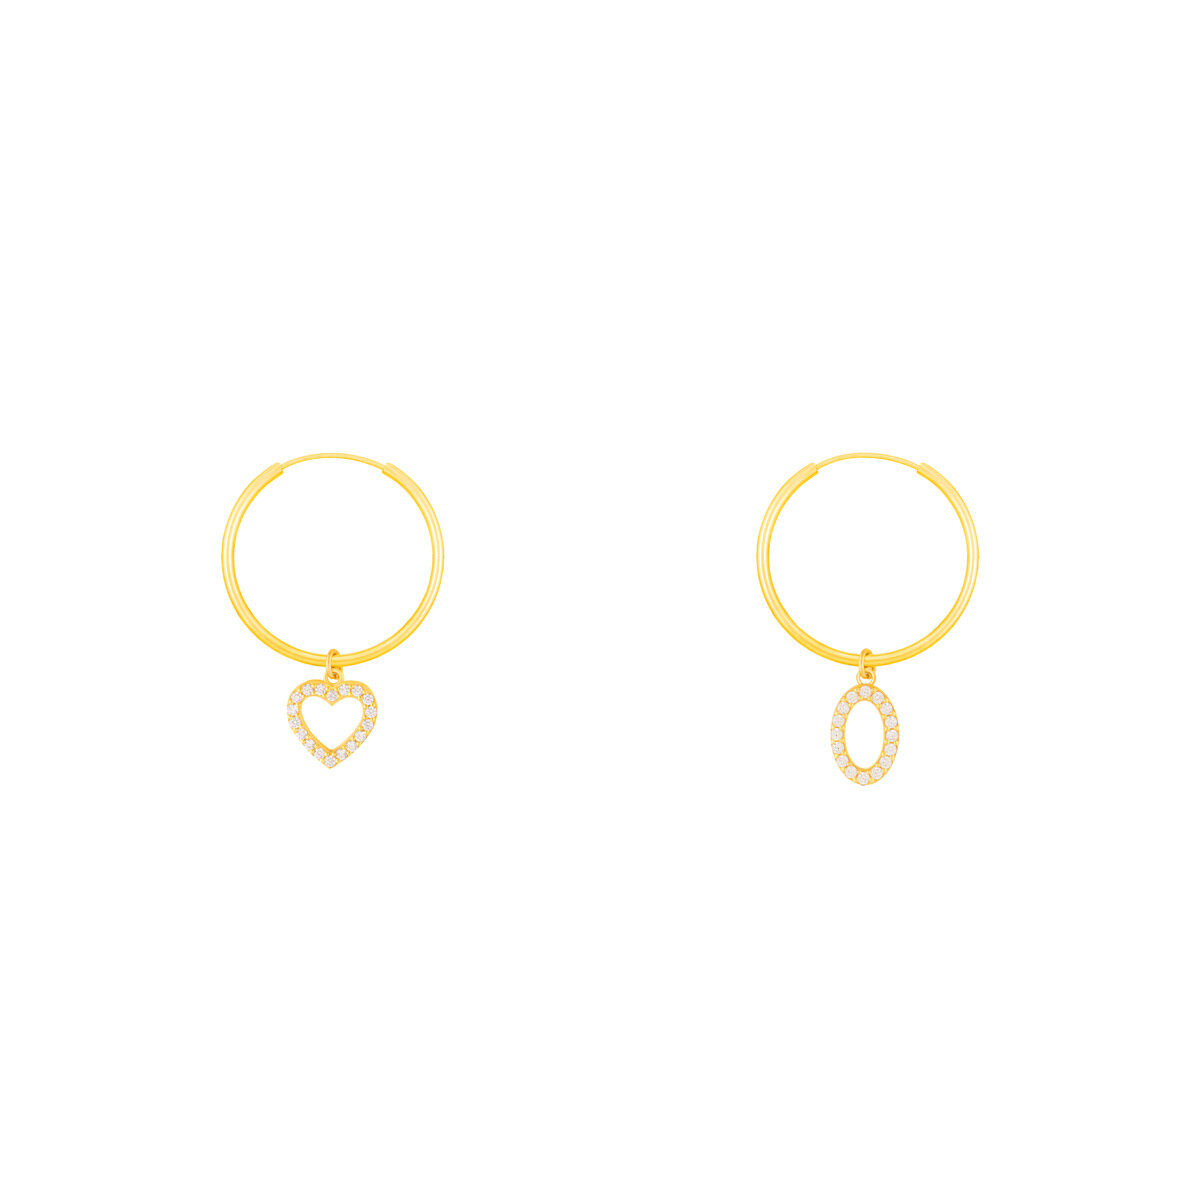 گوشواره طلا آویز دایره و قلب نگین دار